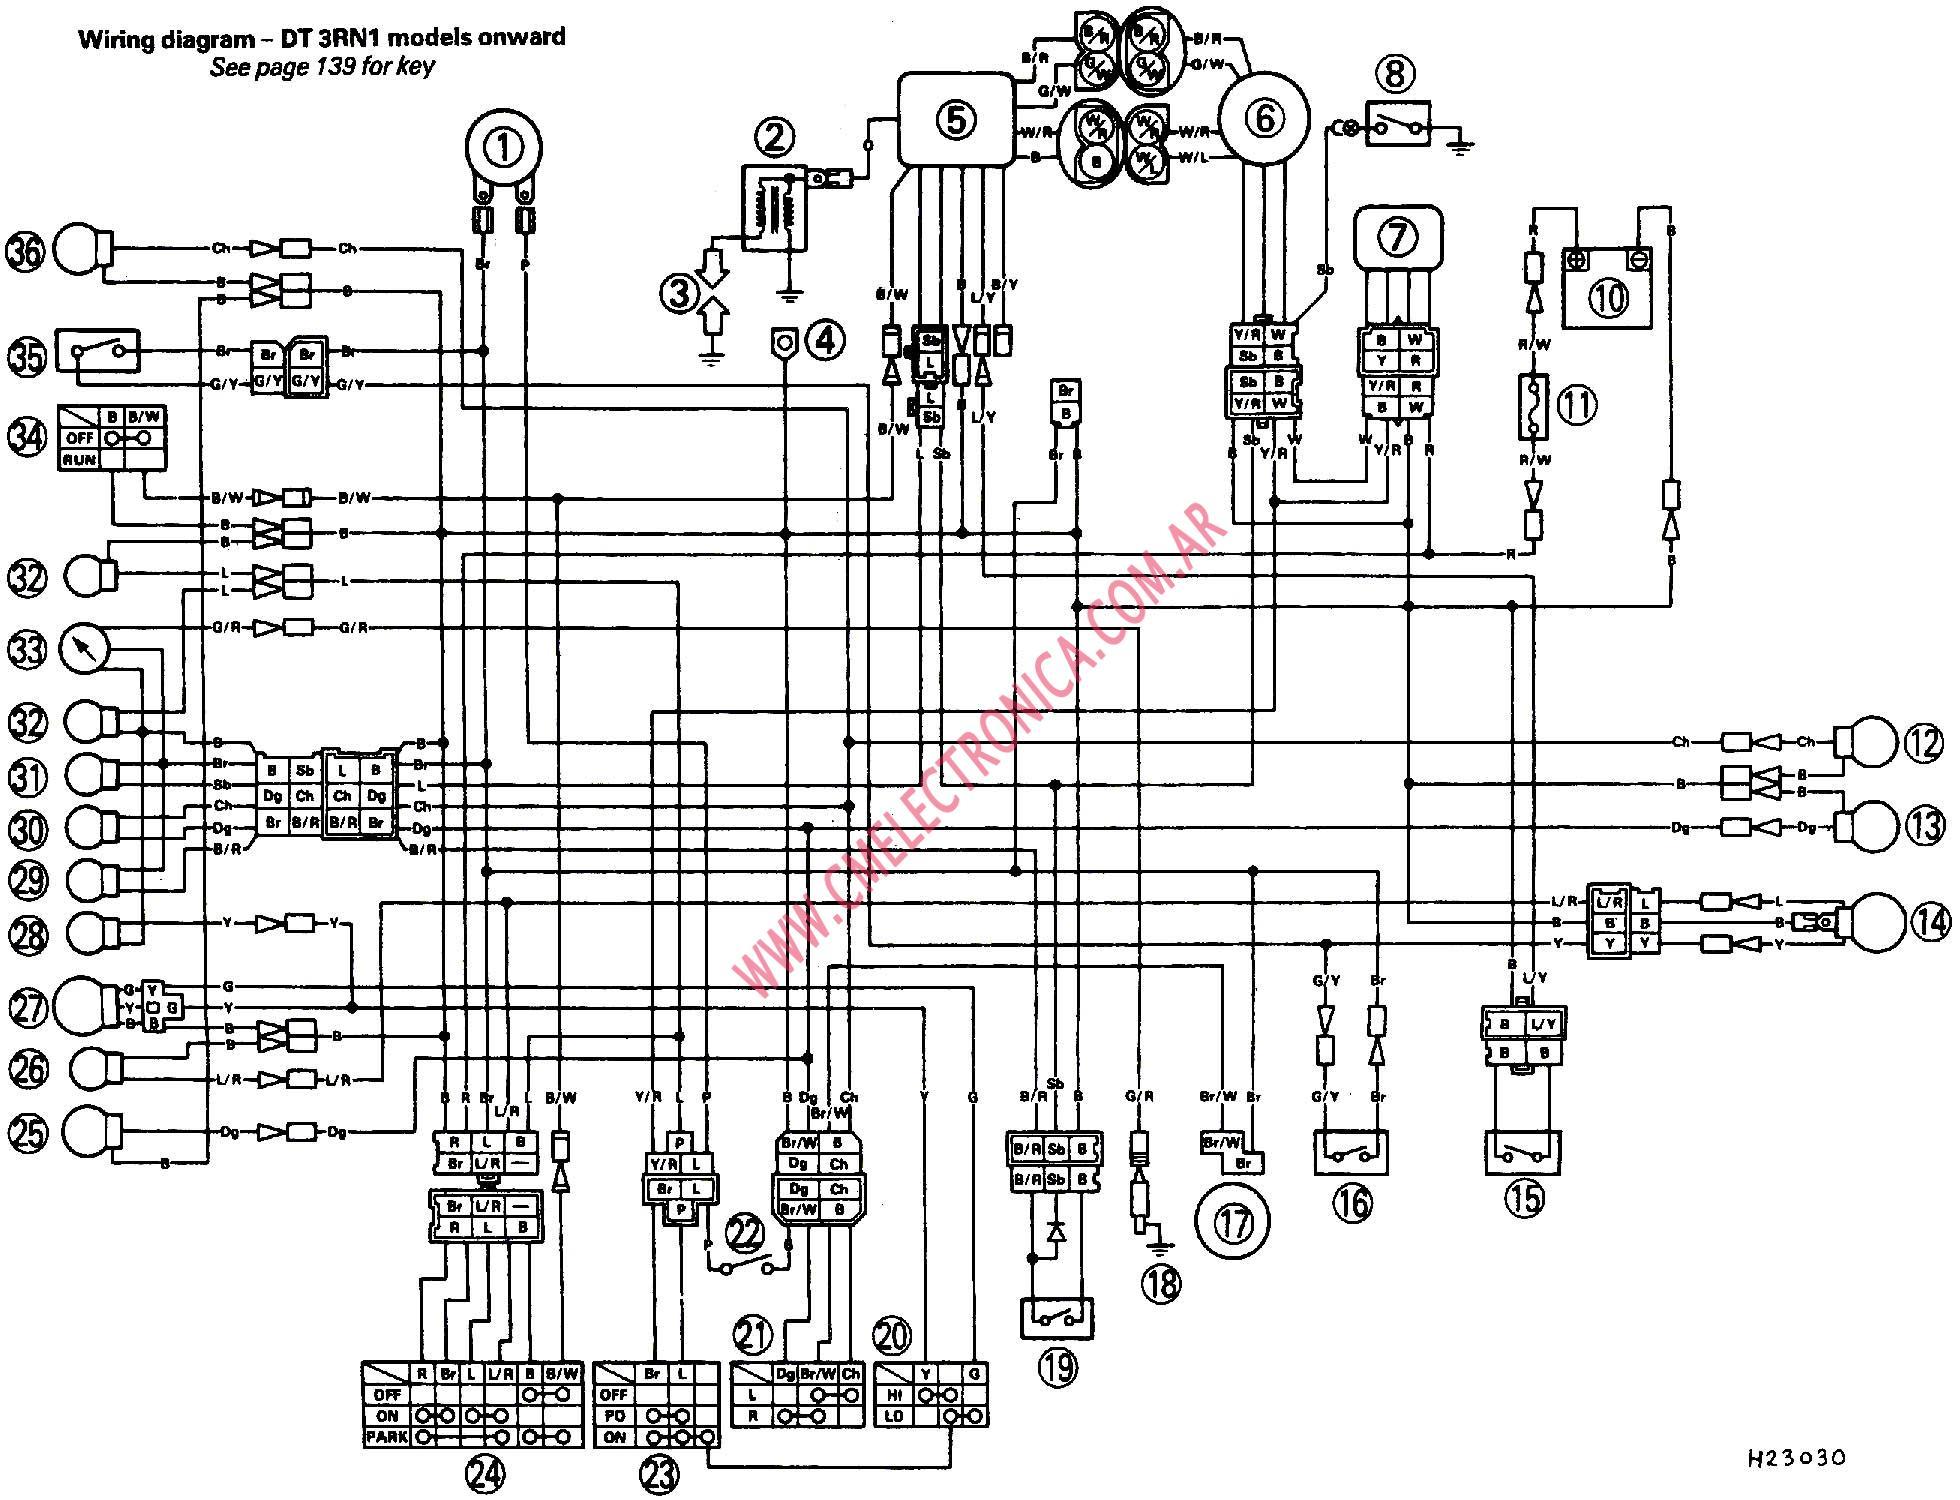 honda marine fuel gauge wiring diagram 1986 trx 350 yamaha motorcycle auto